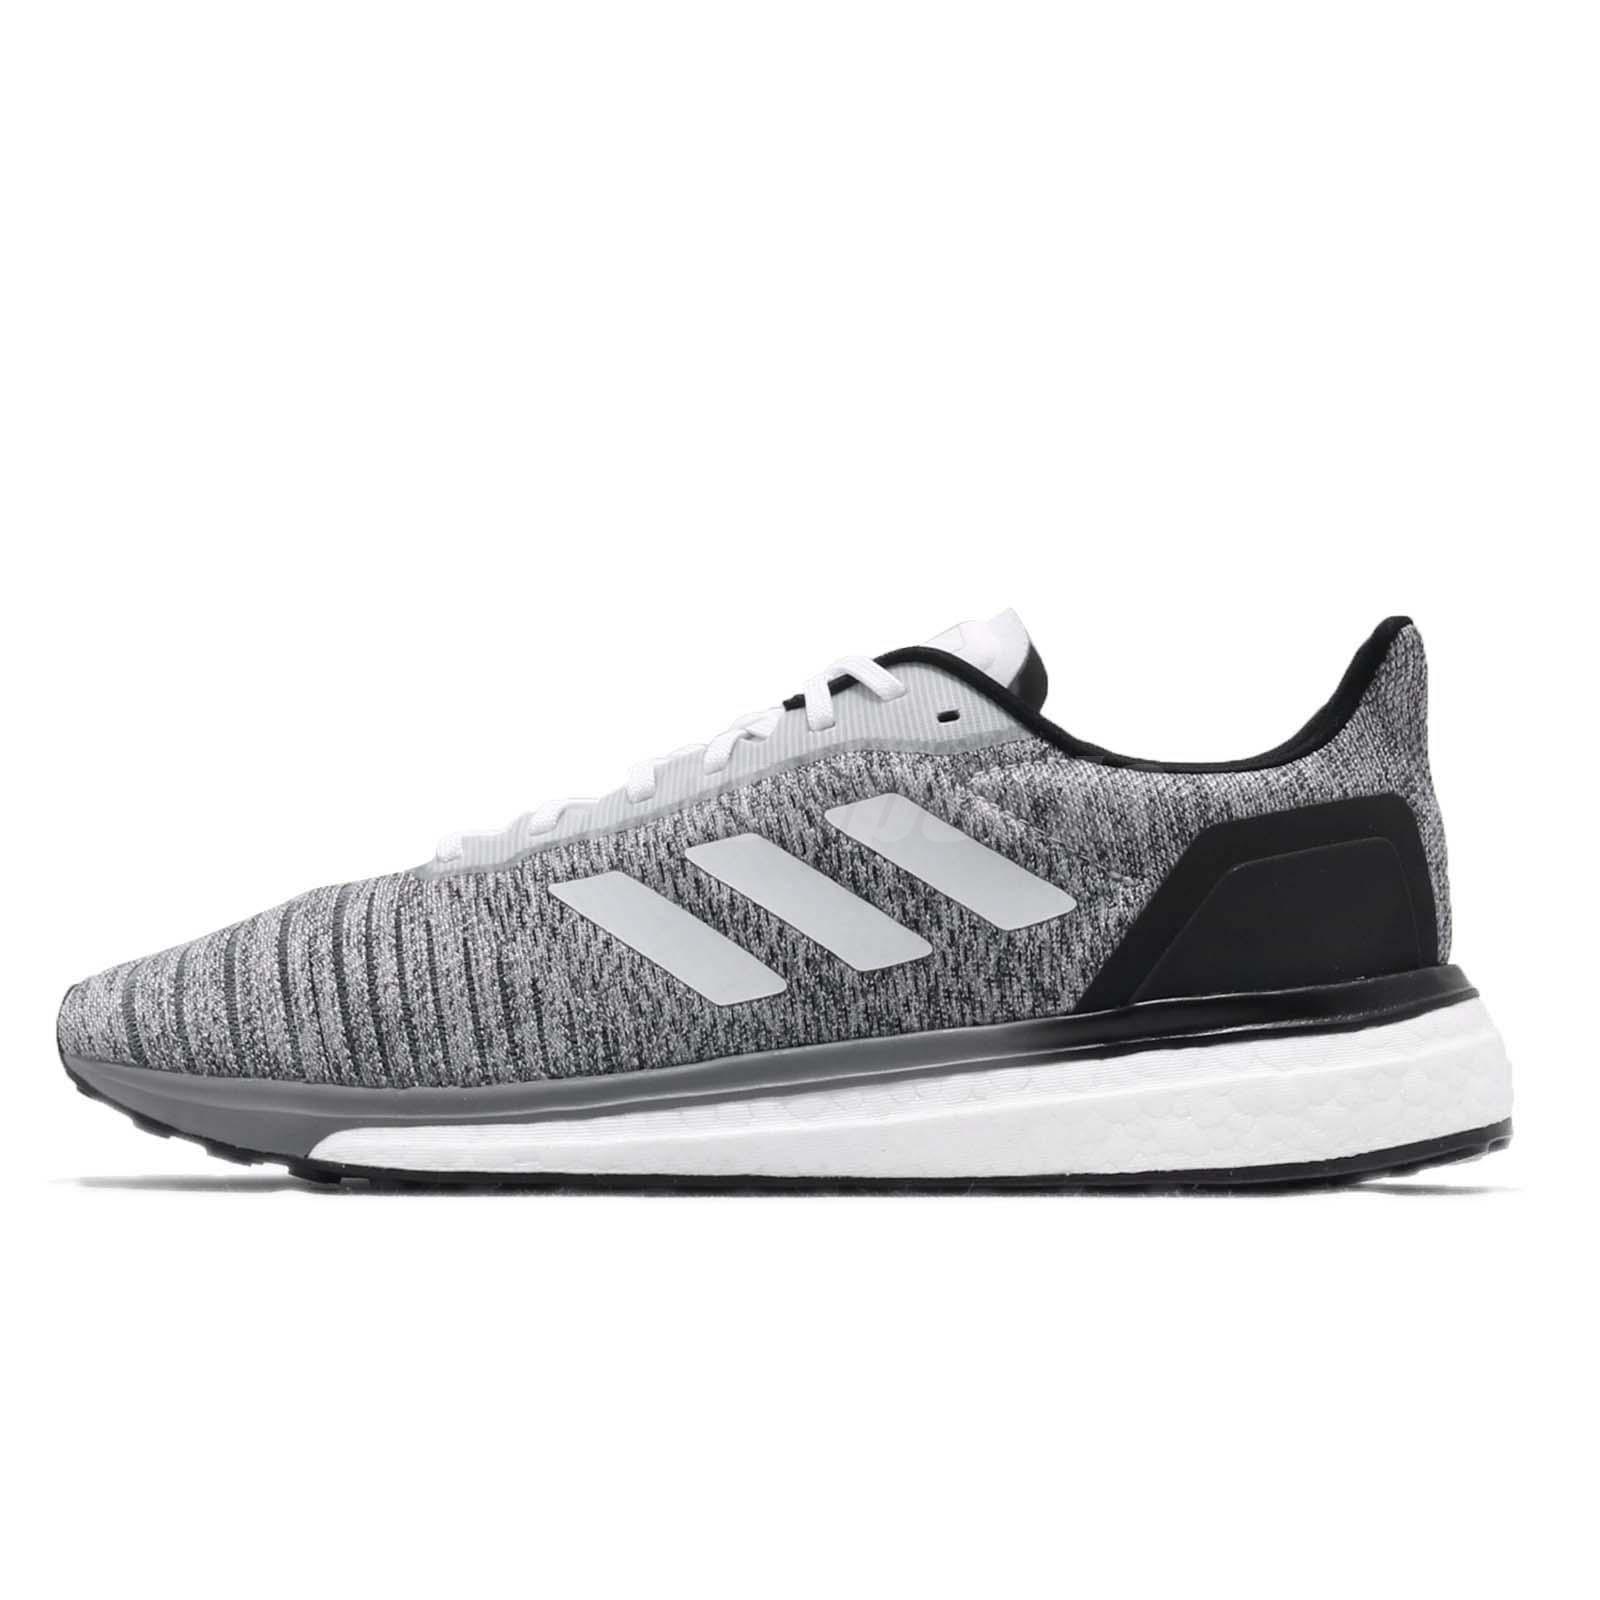 643f23703 adidas Solar Drive M Boost Grey White Black Men Running Shoes Sneakers  AQ0337